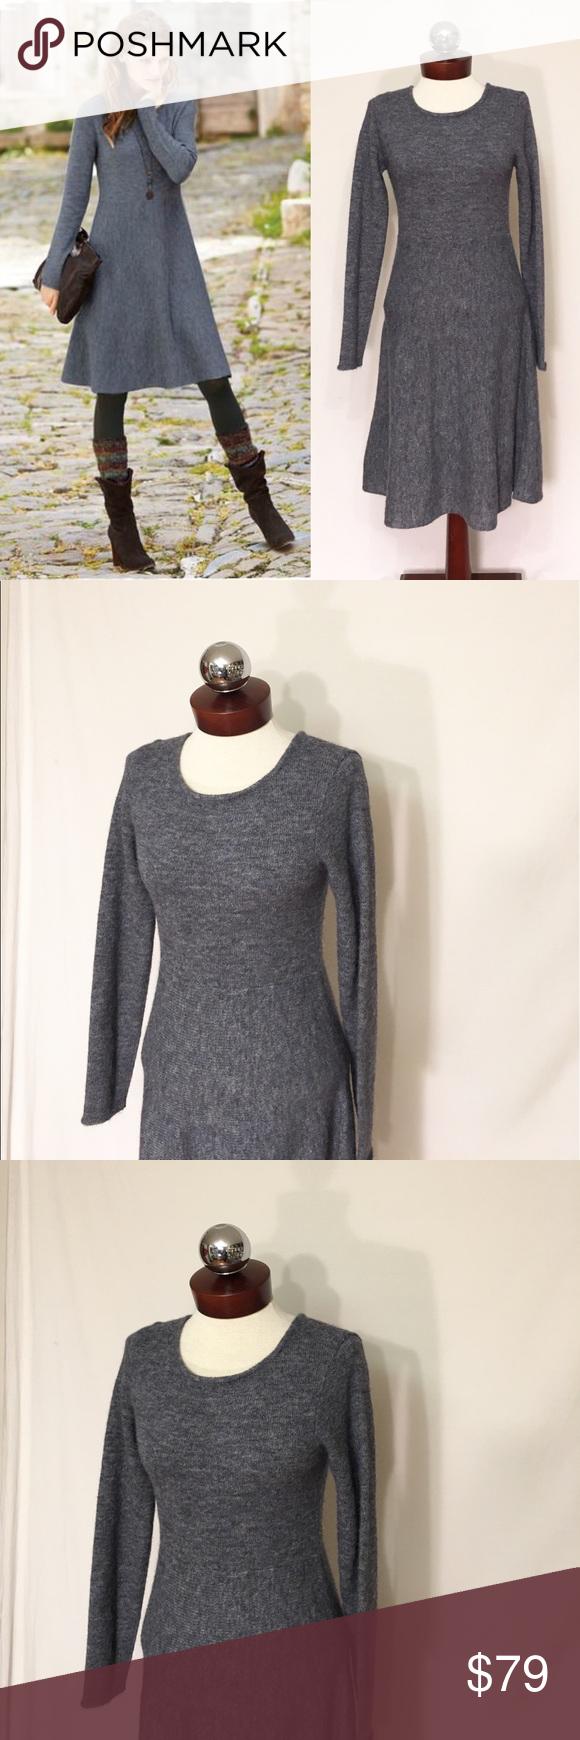 c946aaccfa2 PERUVIAN CONNECTION jasmine alpaca sweater dress Excellent condition! Baby  alpaca